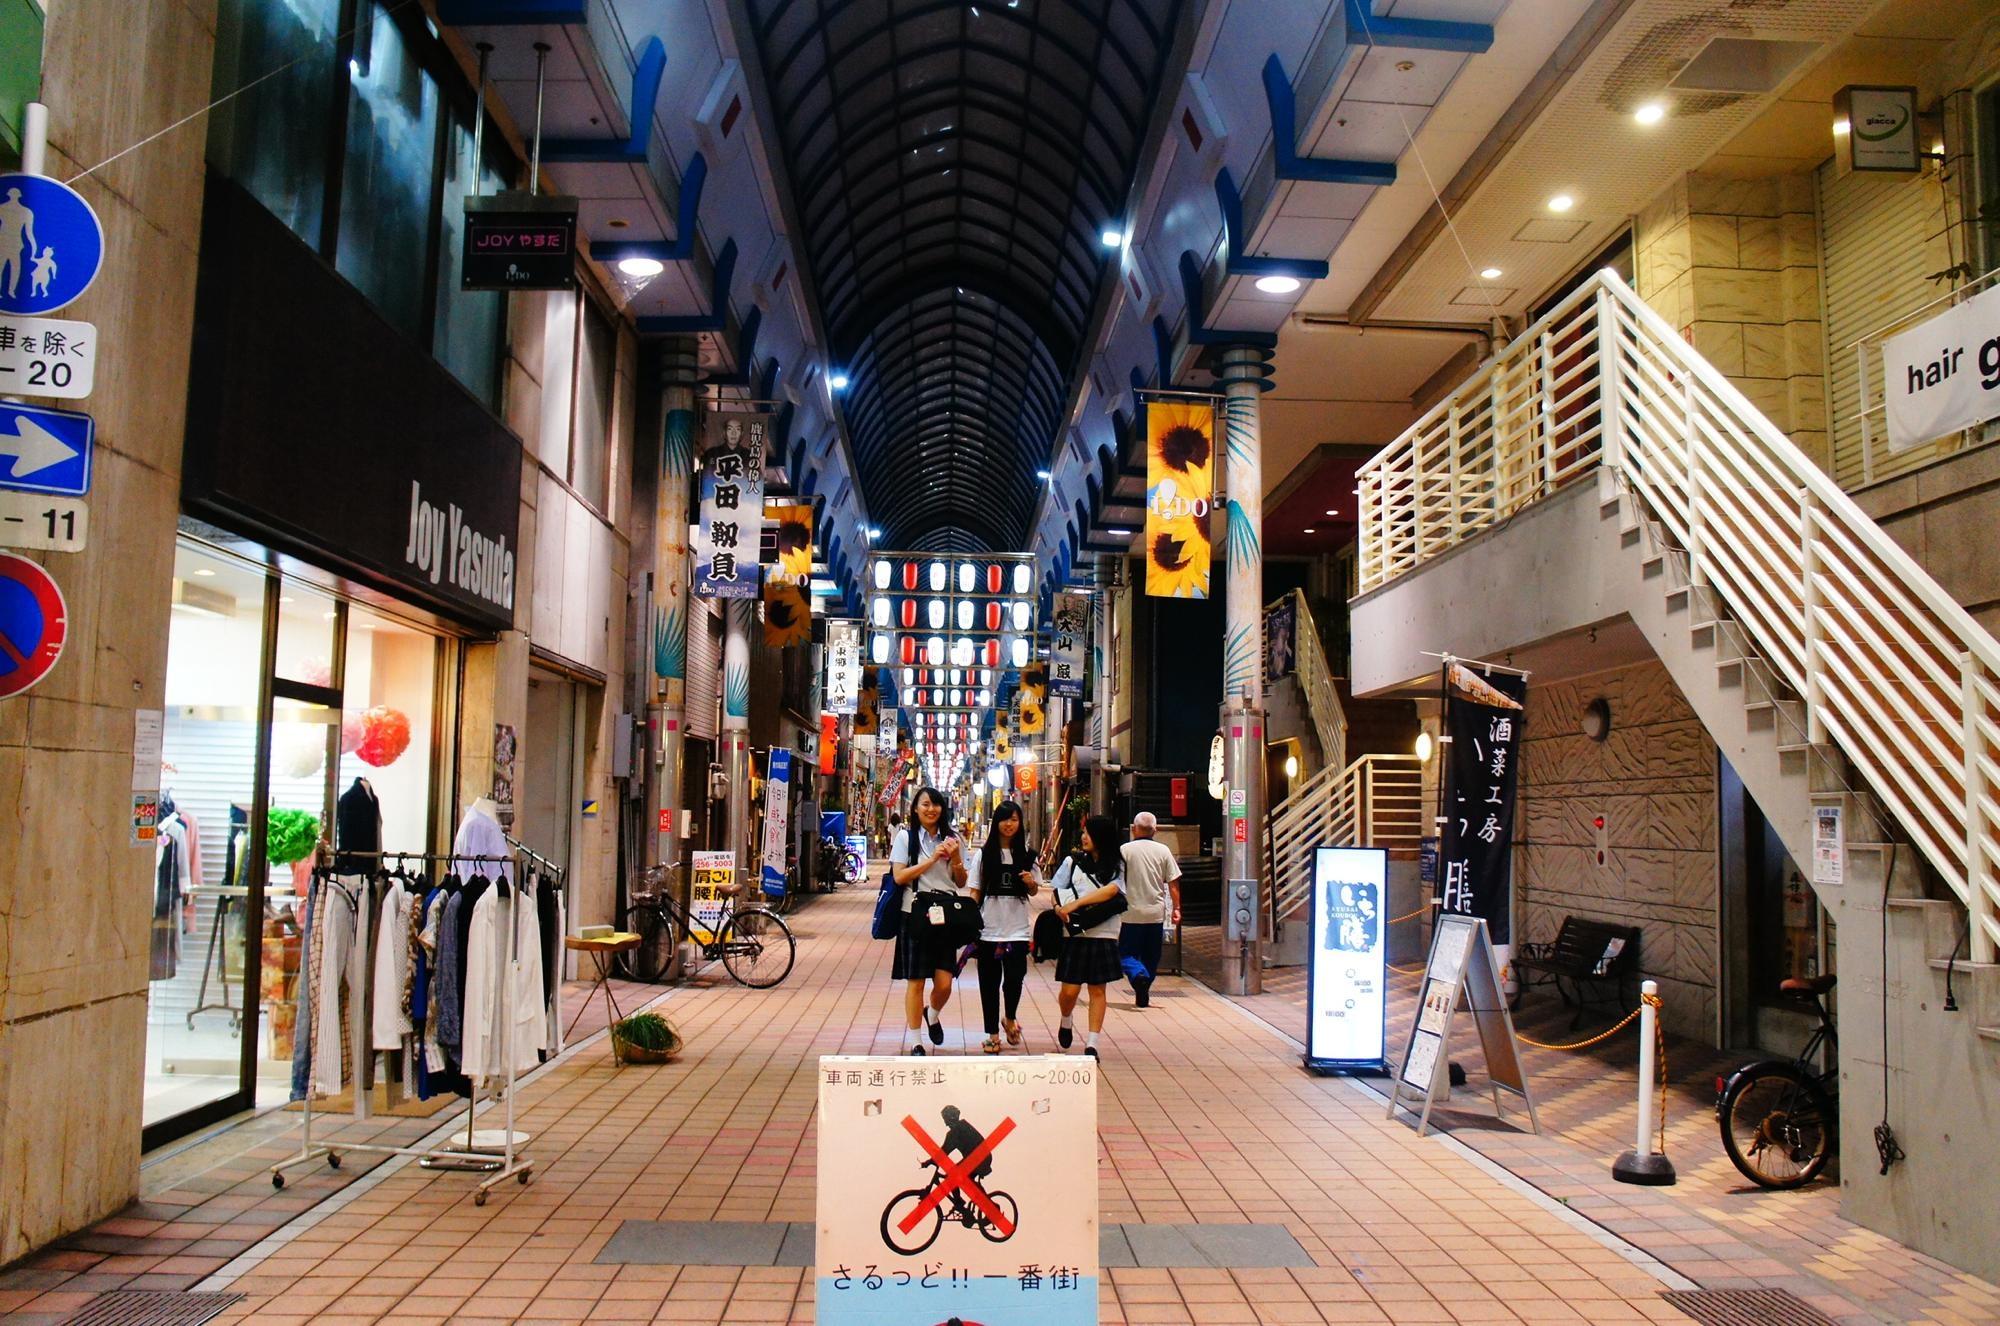 kagoshima_voyage_2015_DSC01147.jpg